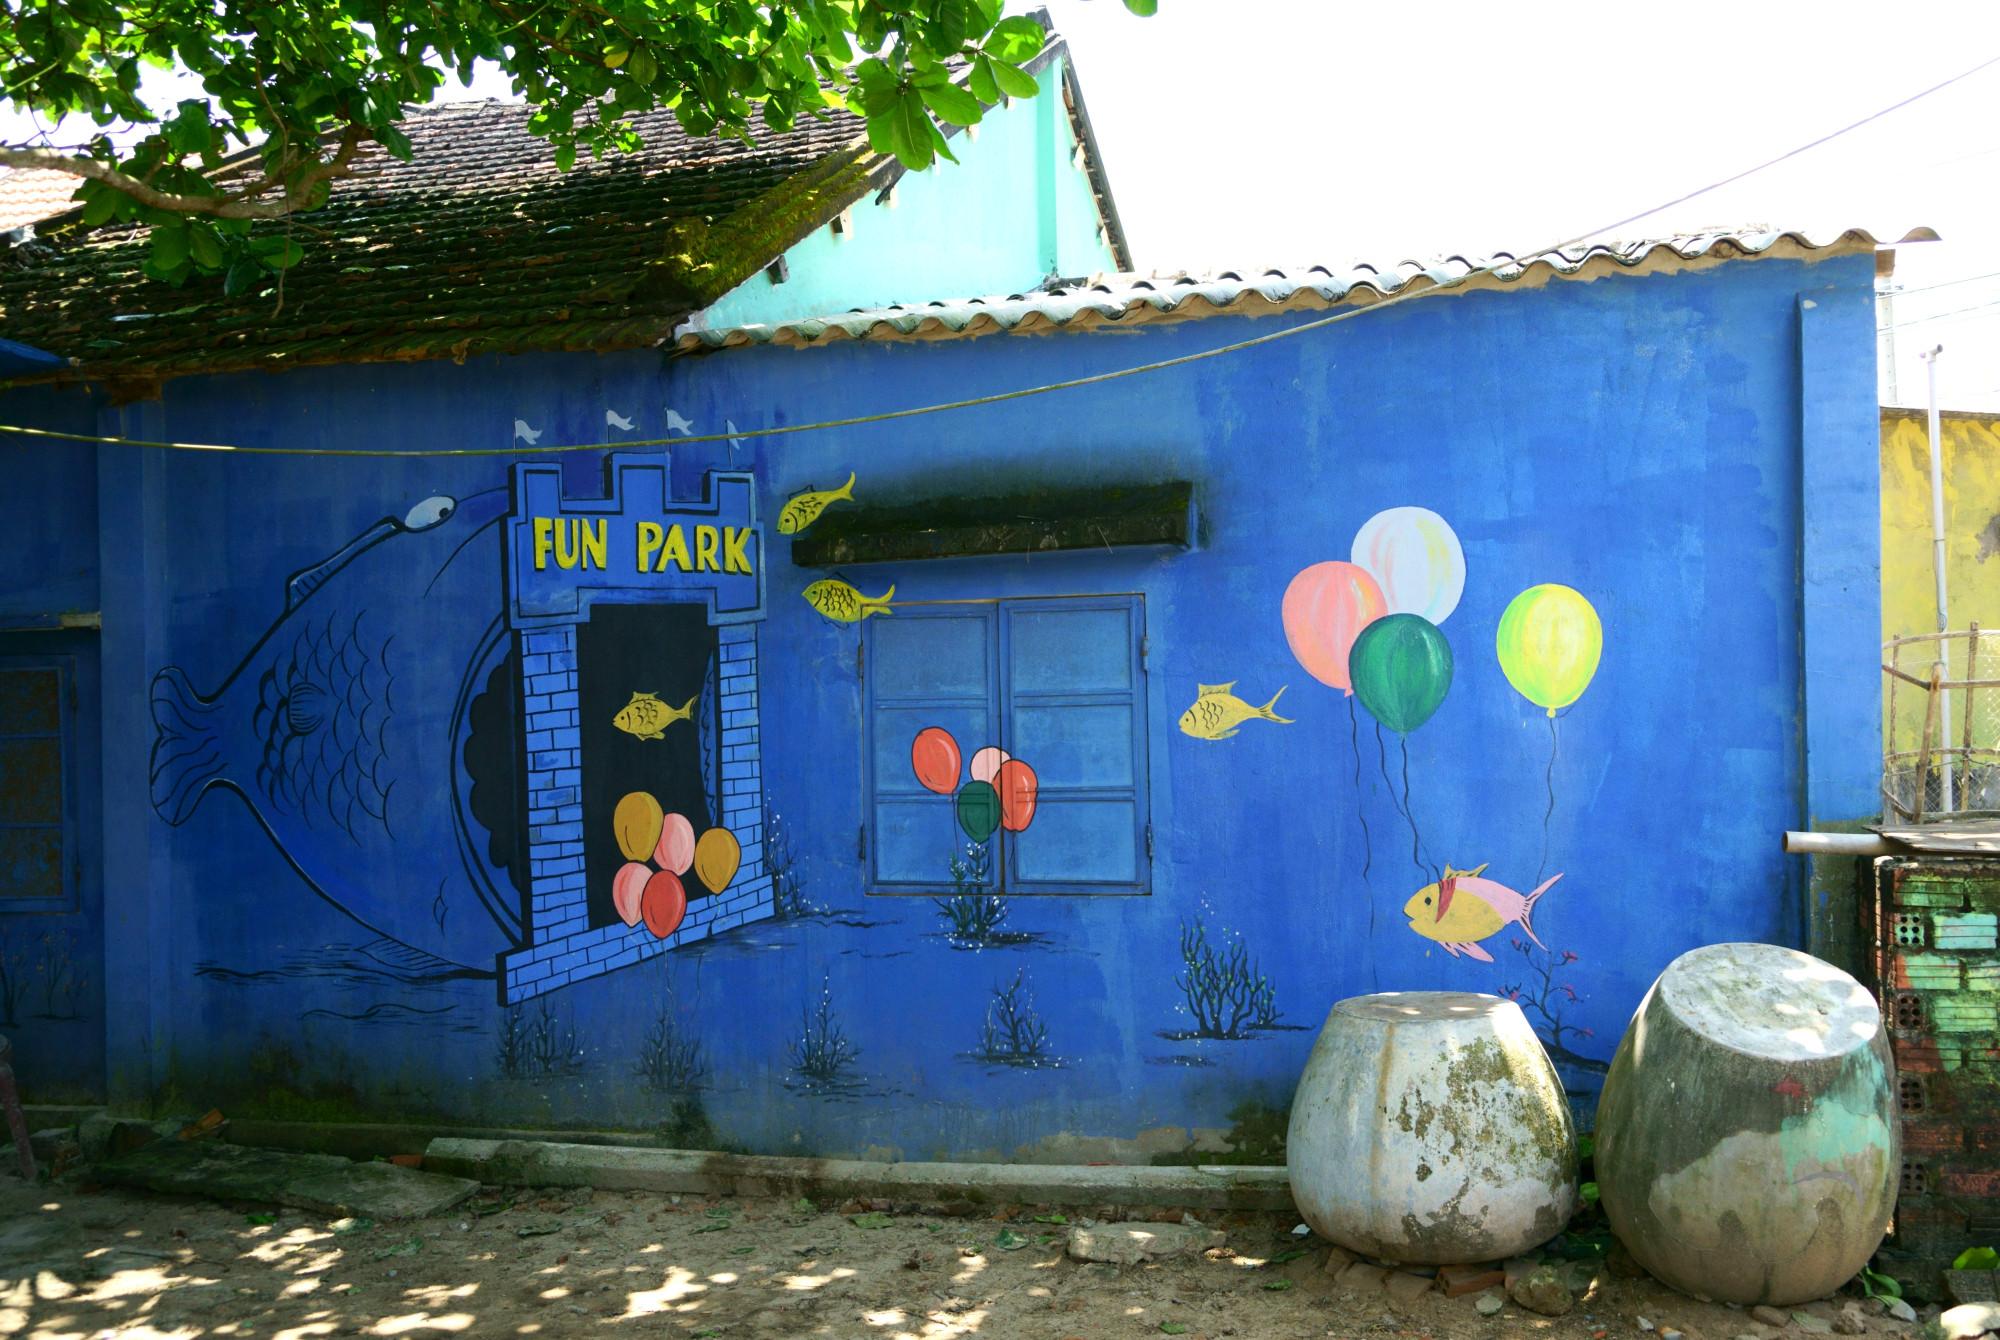 Tam Thanh Mural Village Half Day tour